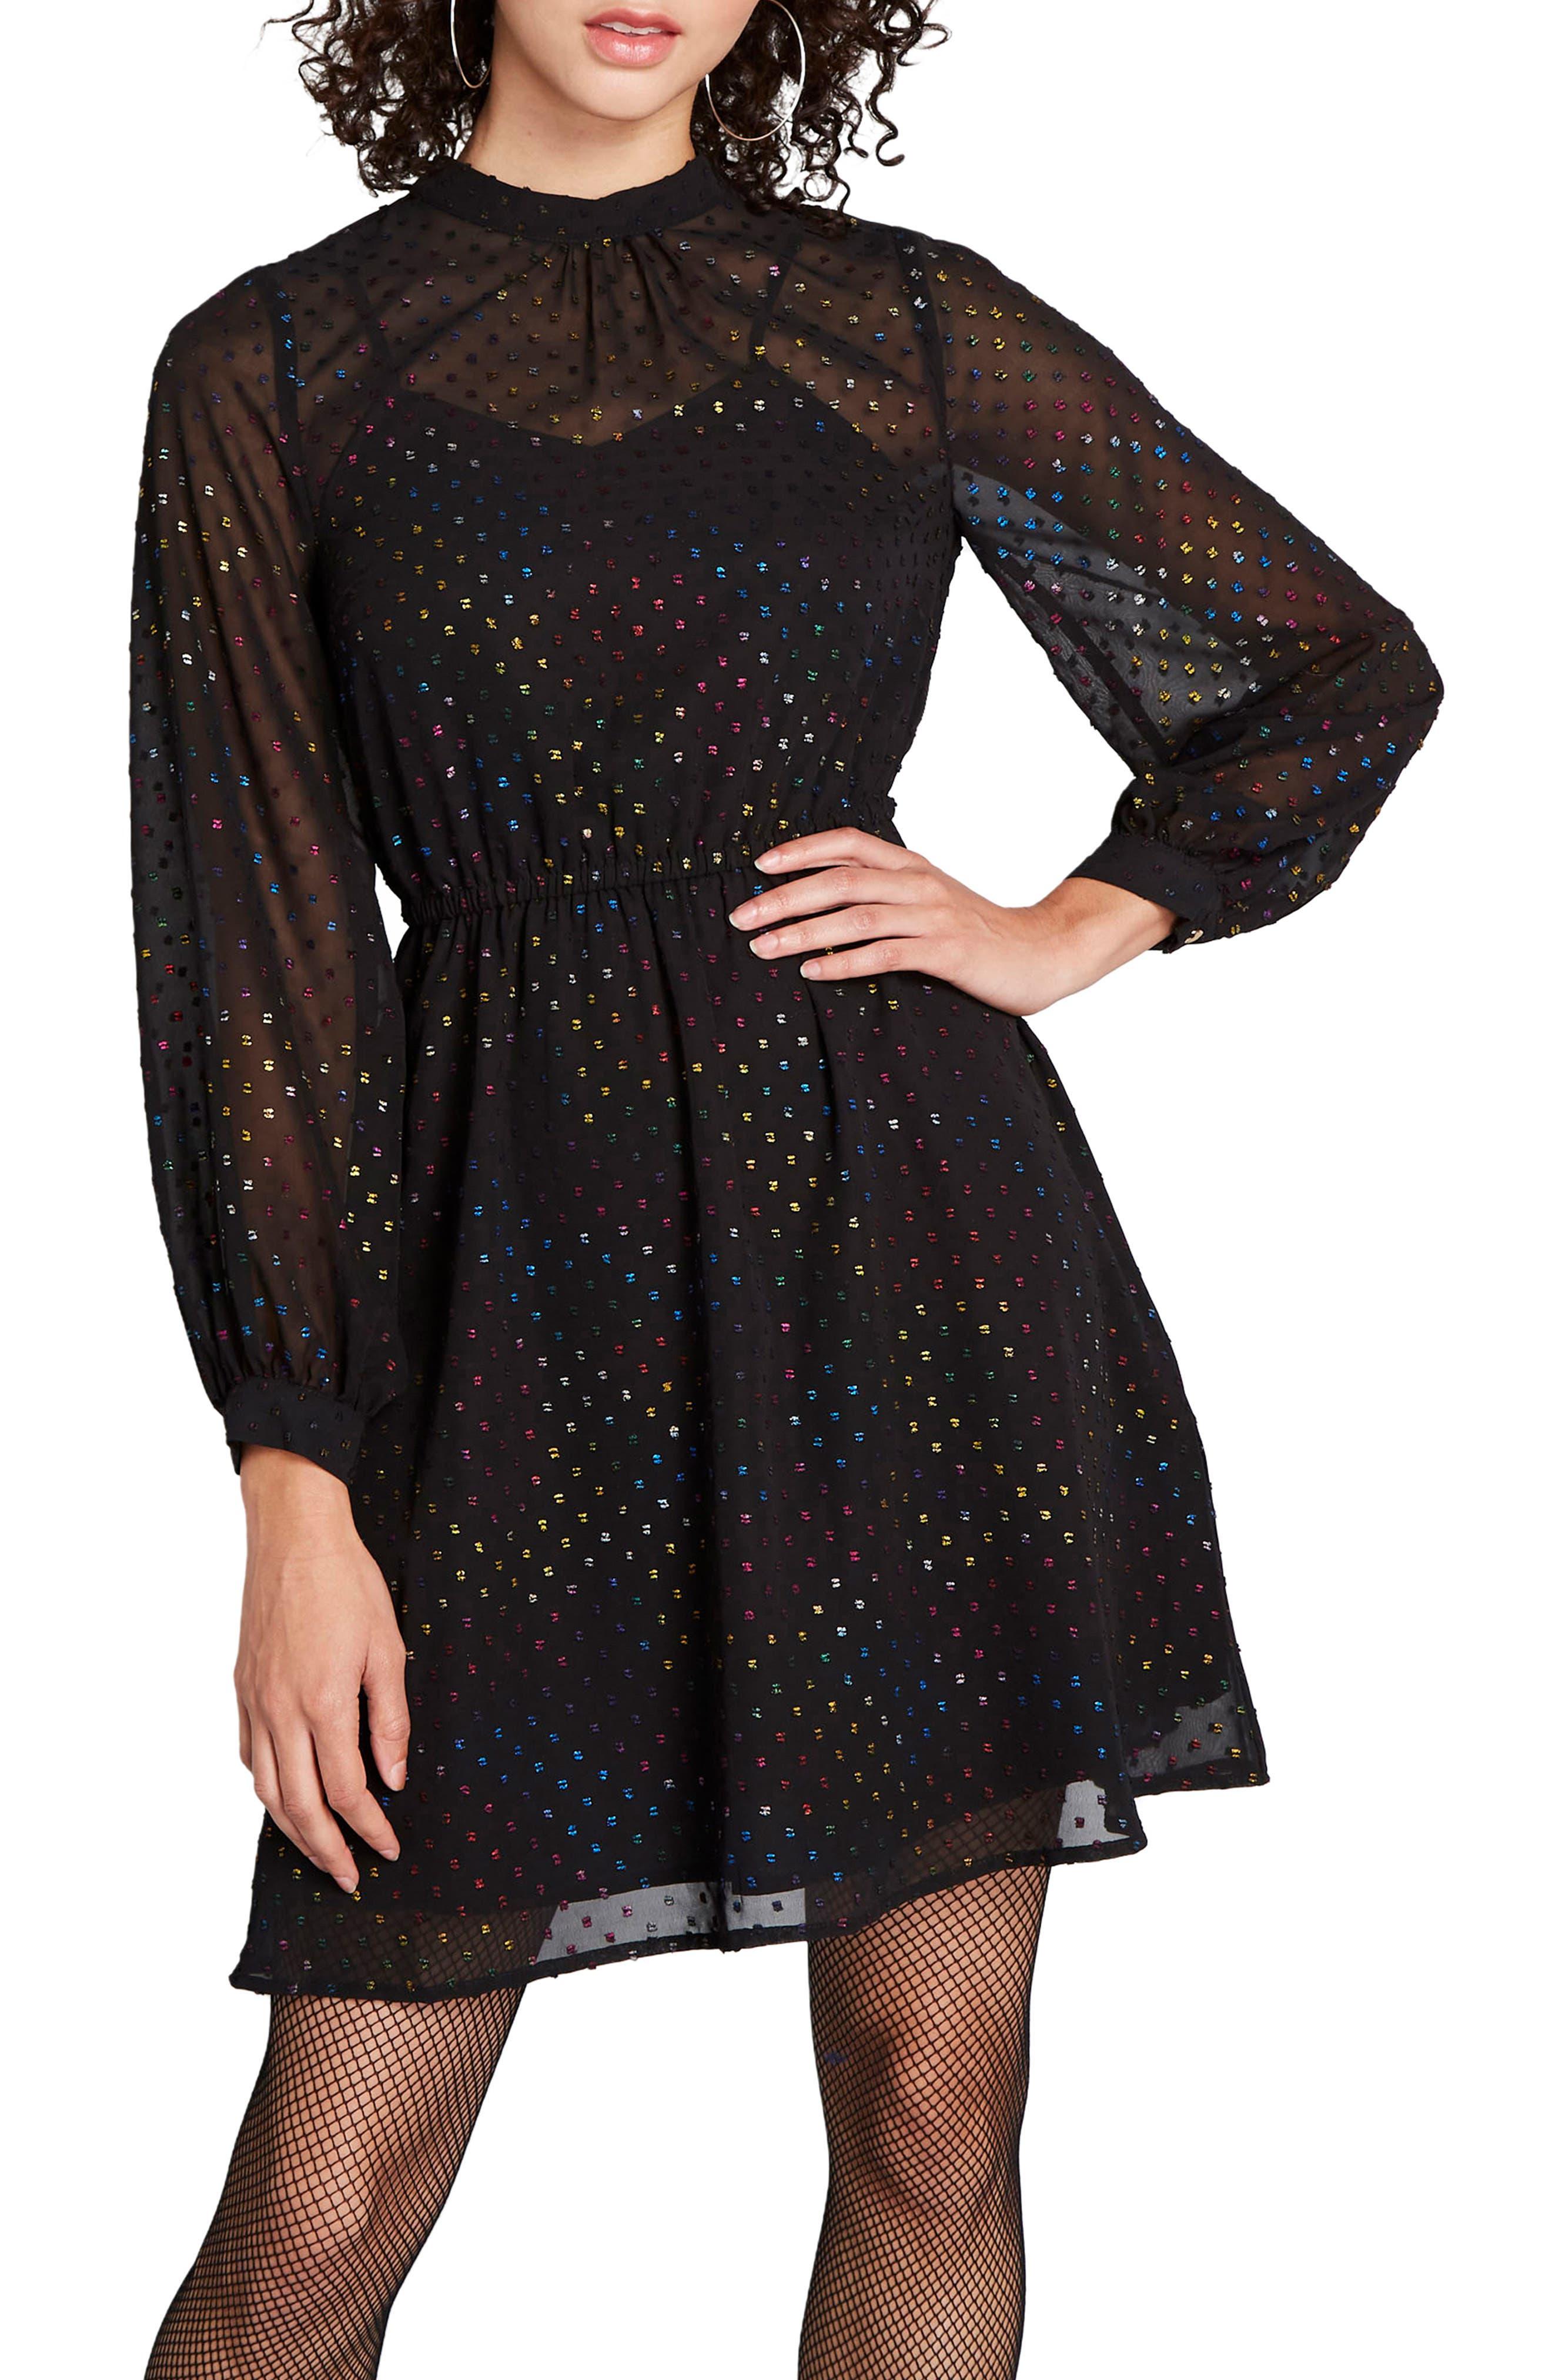 70s Dresses – Disco Dress, Hippie Dress, Wrap Dress Womens Modcloth Rainbow Swiss Dot Long Sleeve Fit  Flare Dress $99.00 AT vintagedancer.com